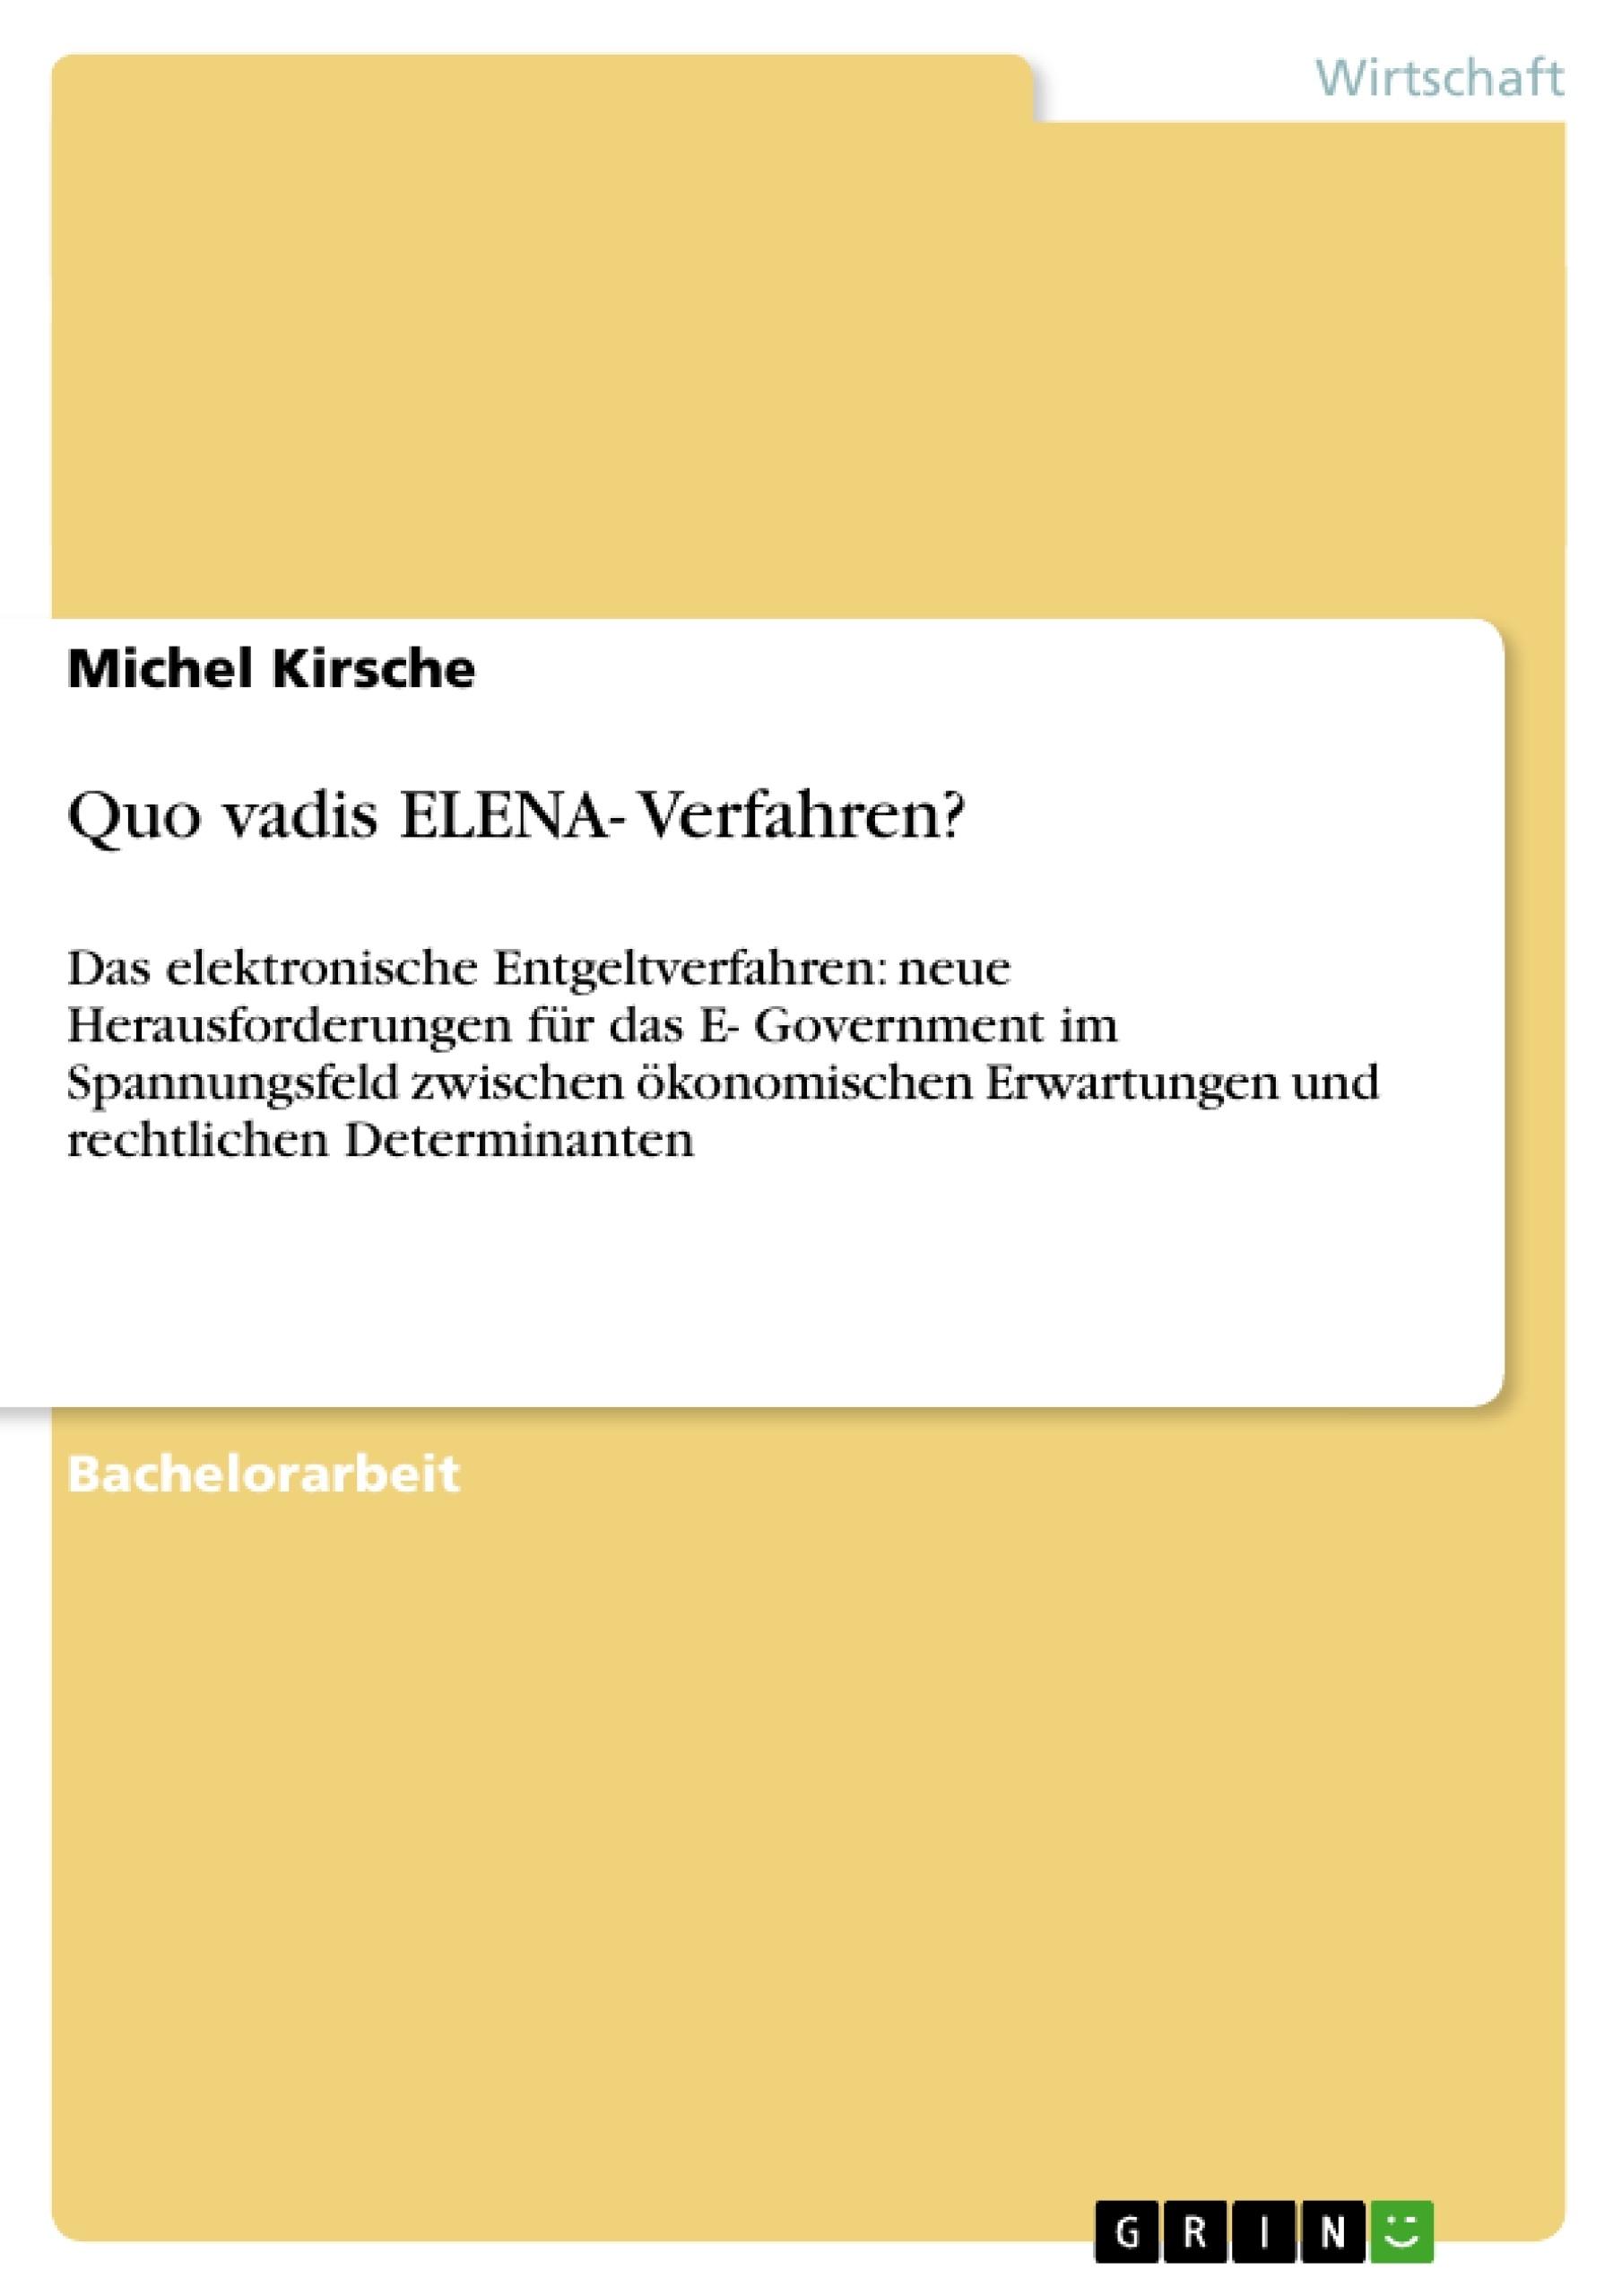 Titel: Quo vadis ELENA- Verfahren?